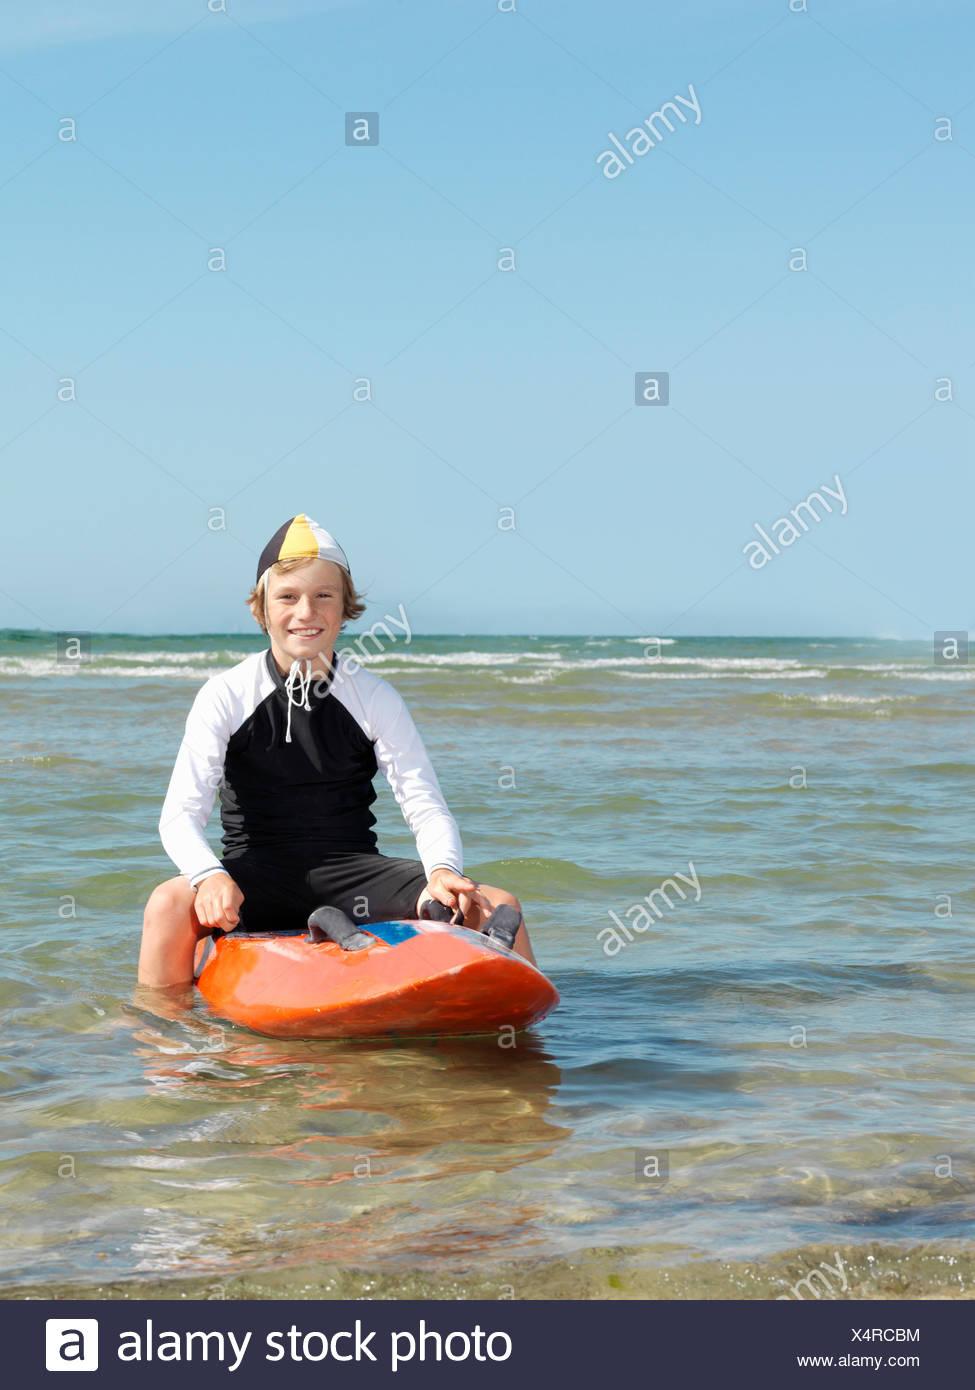 Portrait of boy nipper (child surf life savers) astride surfboard, Altona, Melbourne, Australia - Stock Image